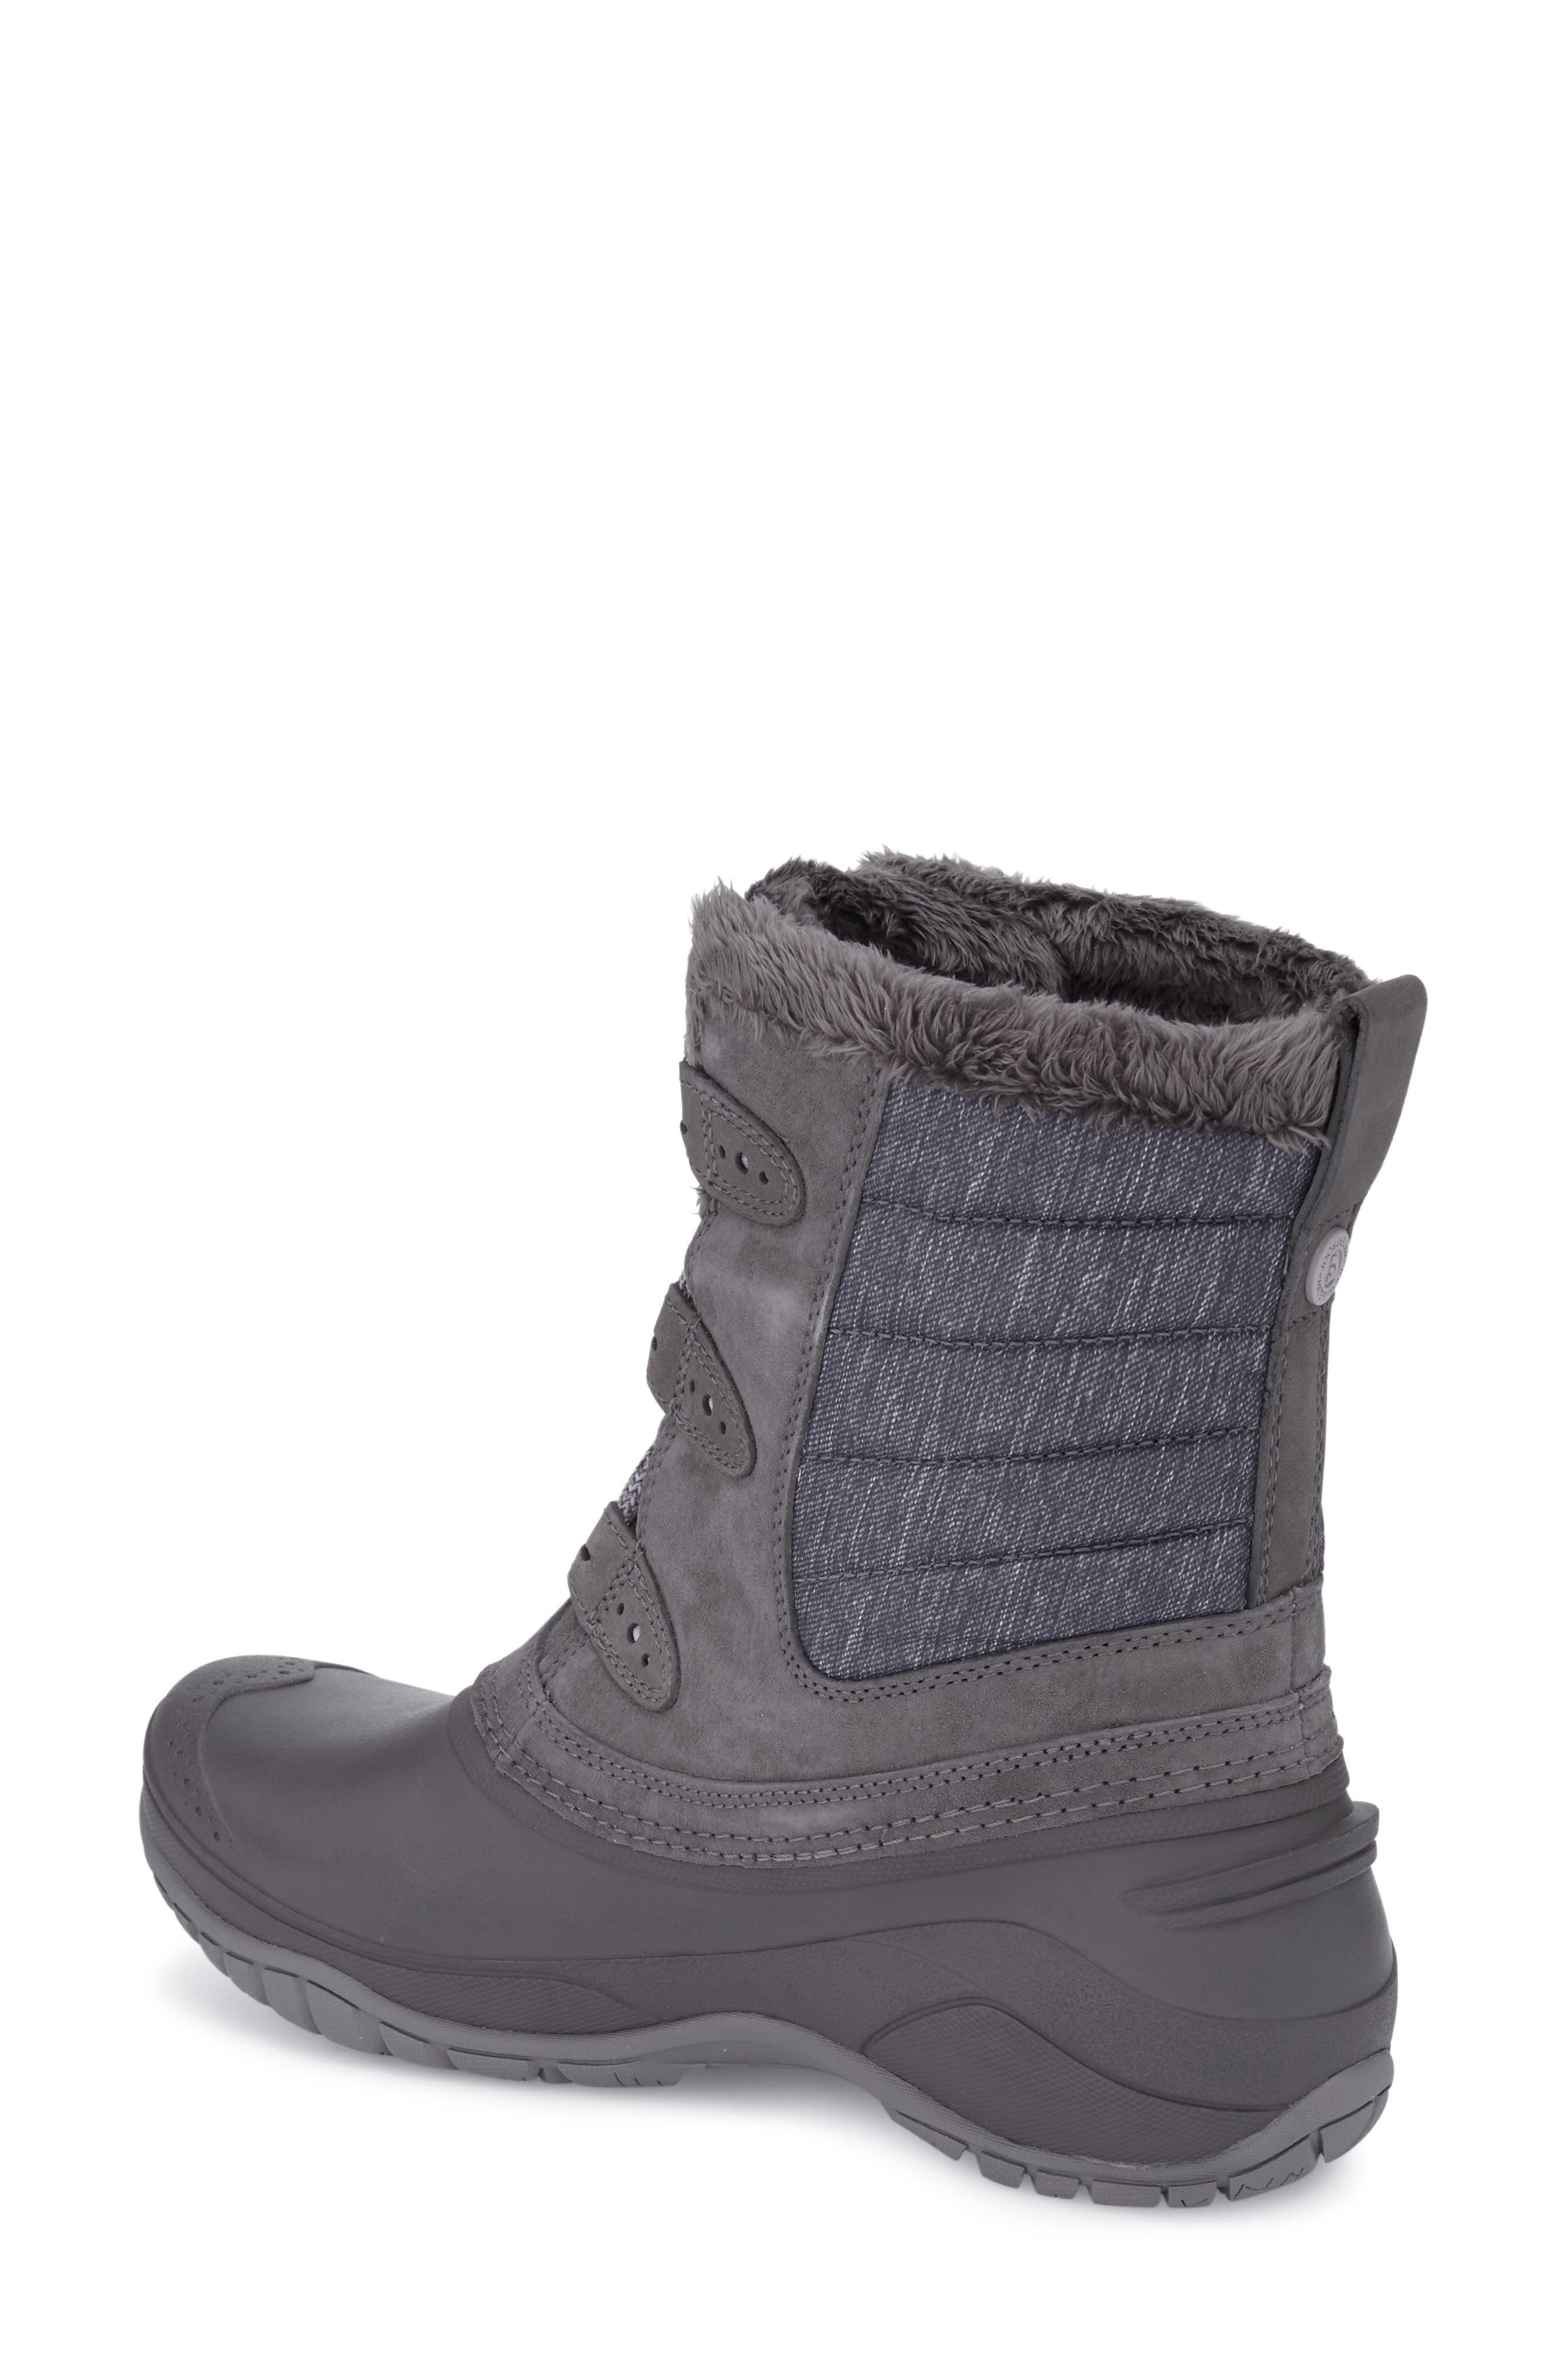 Shellista II Waterproof Boot,                             Alternate thumbnail 18, color,